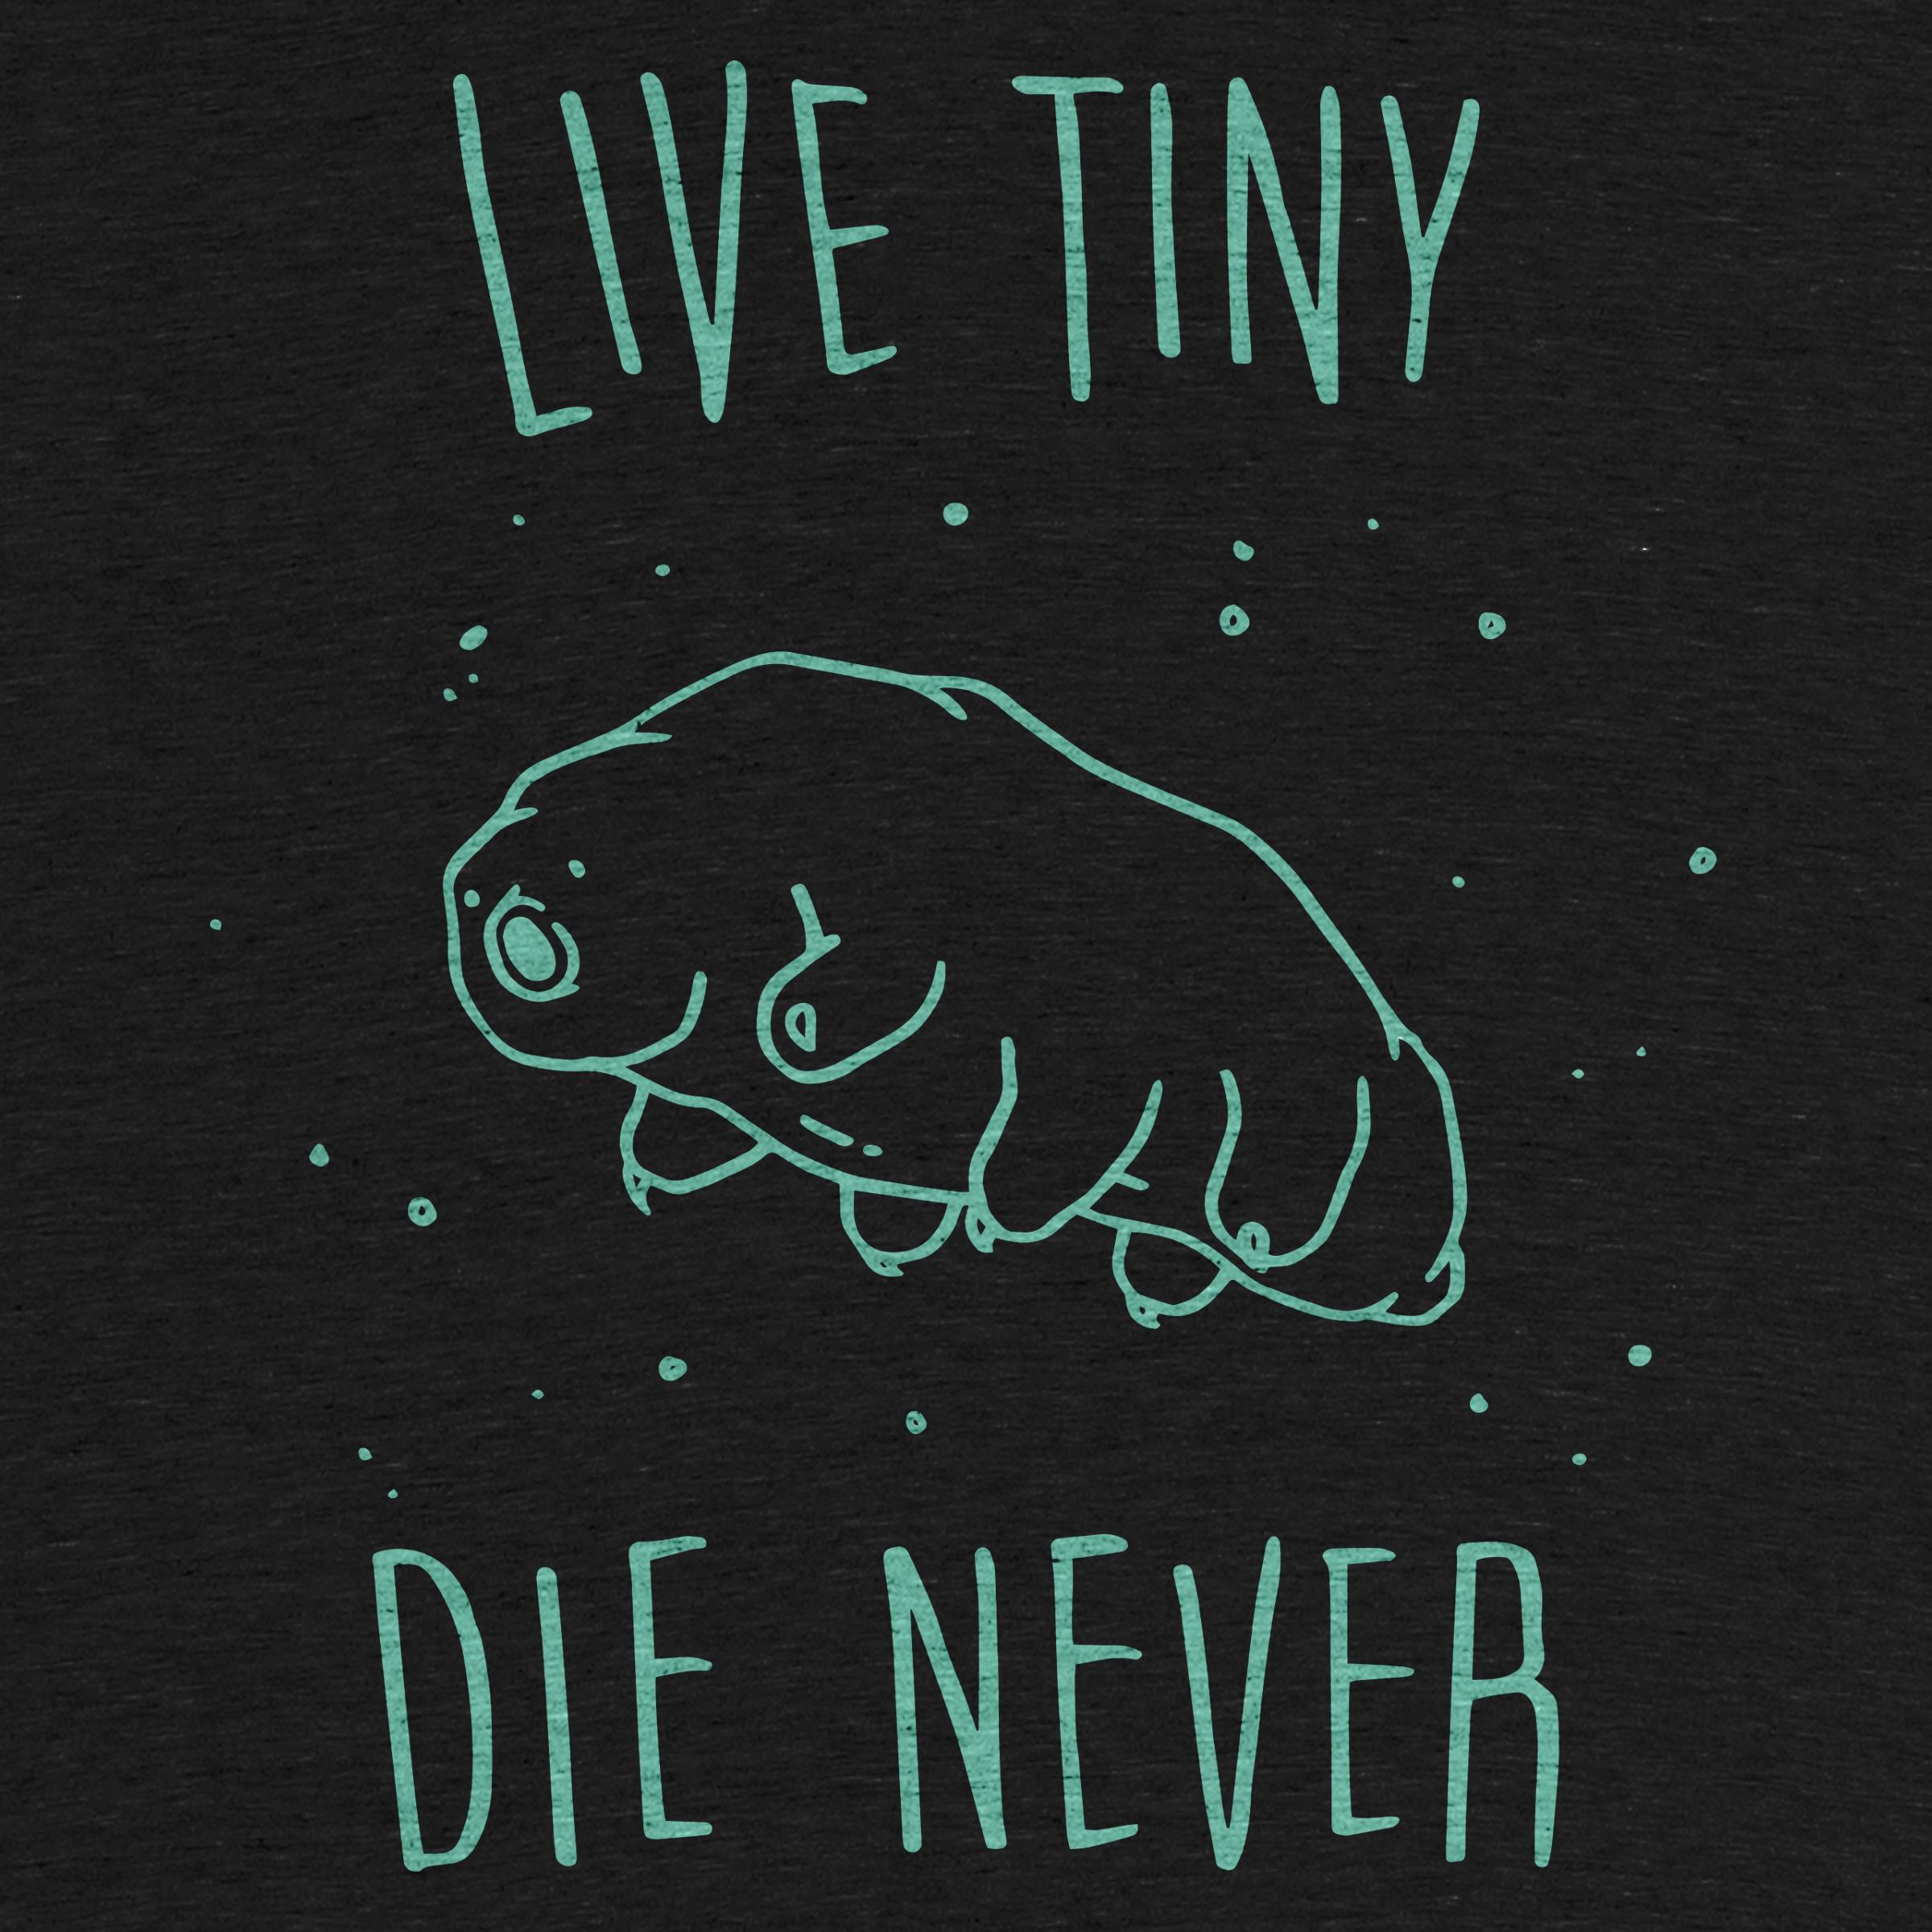 Live Tiny Tardigrade Detail